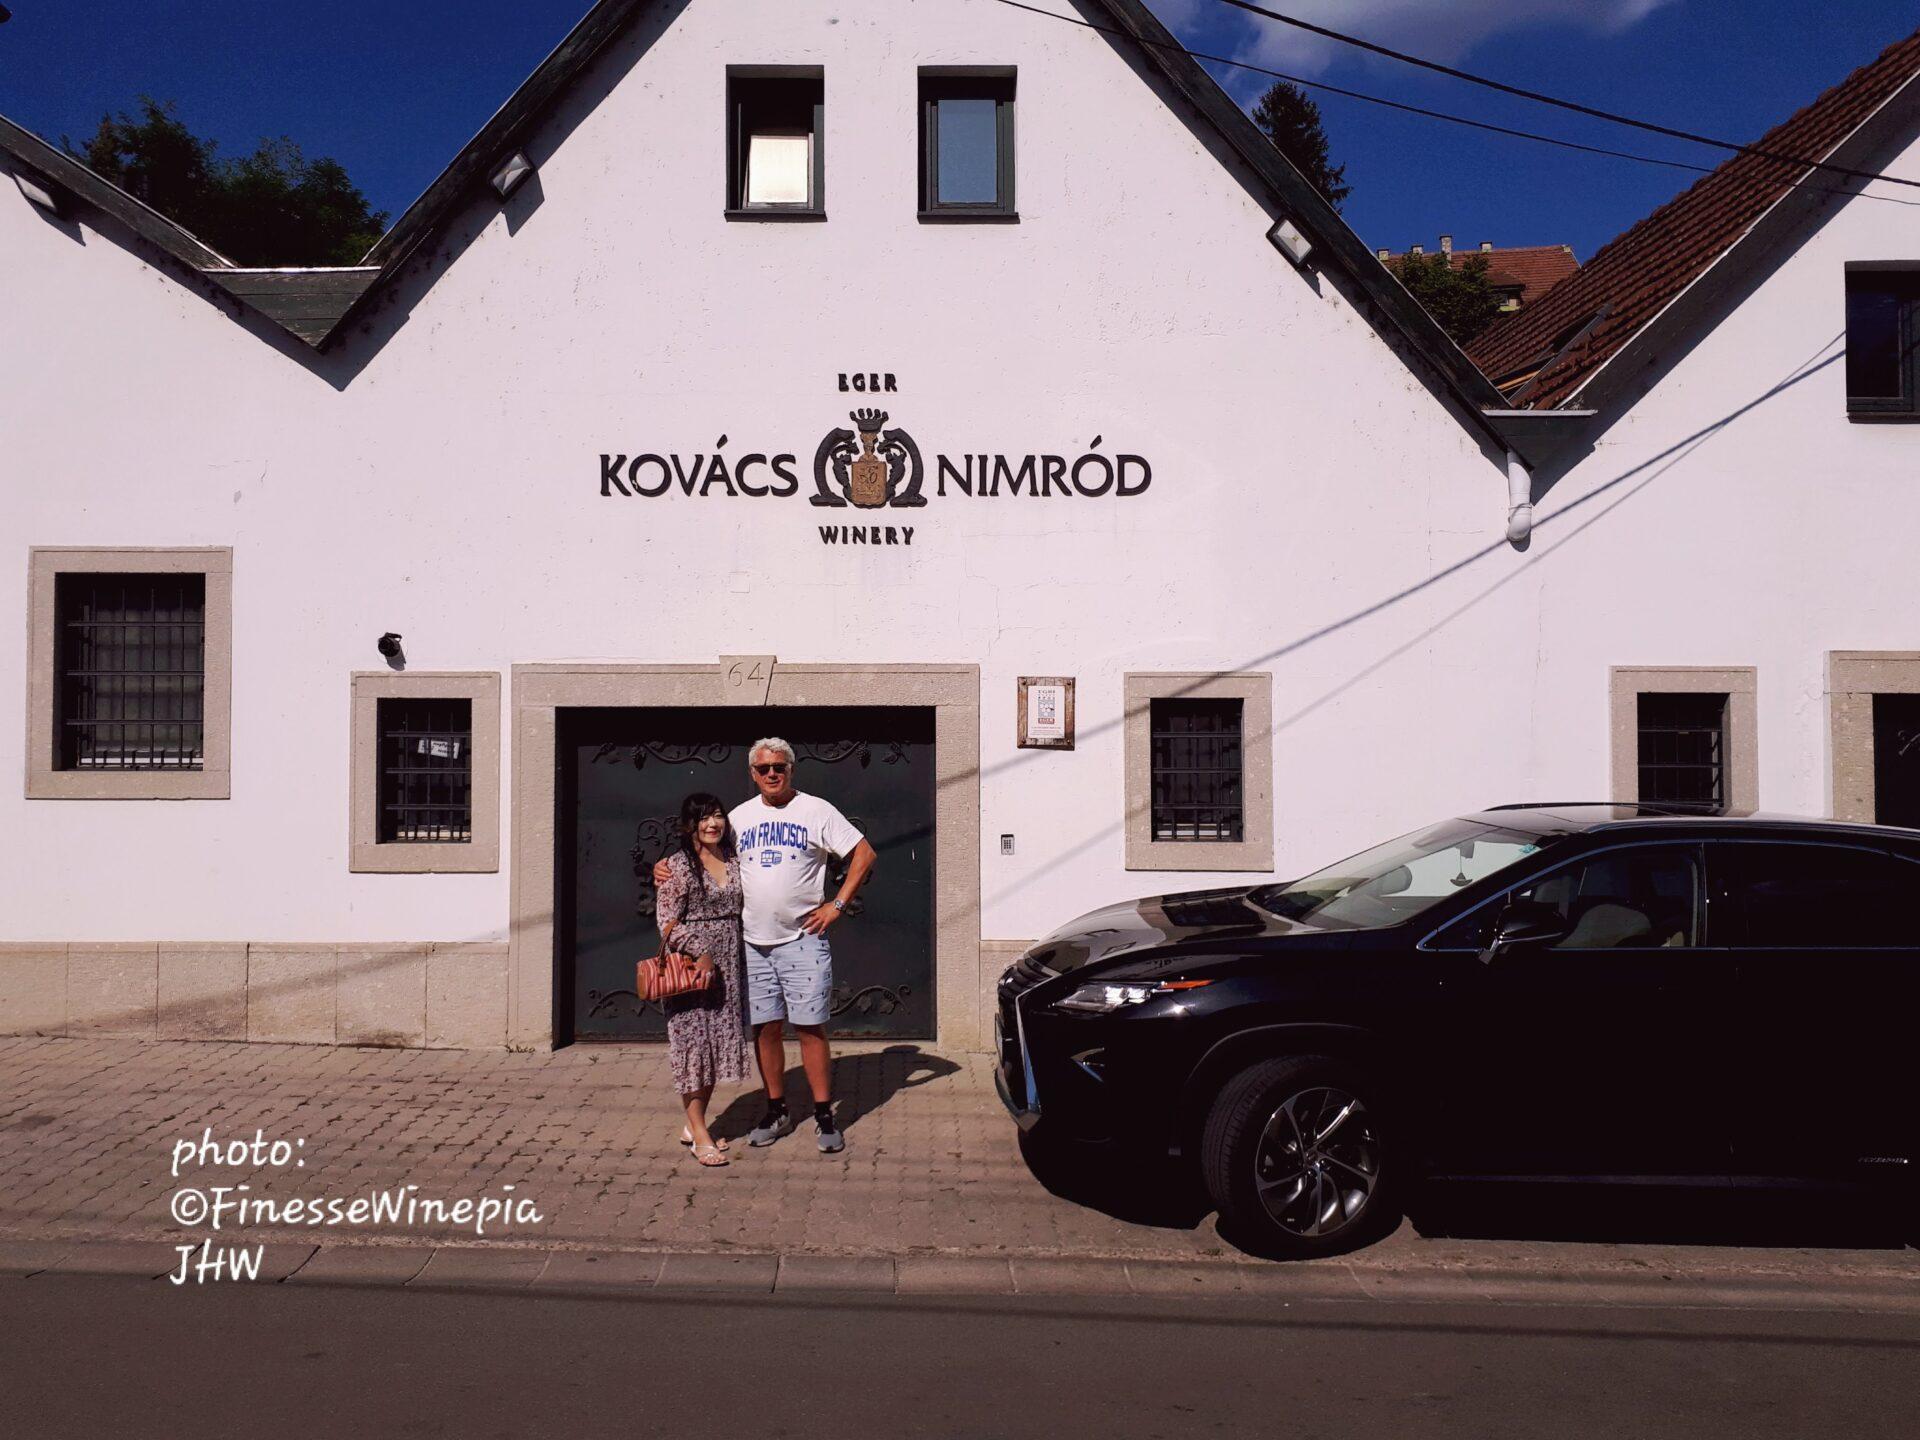 Kovács Nimród Winery